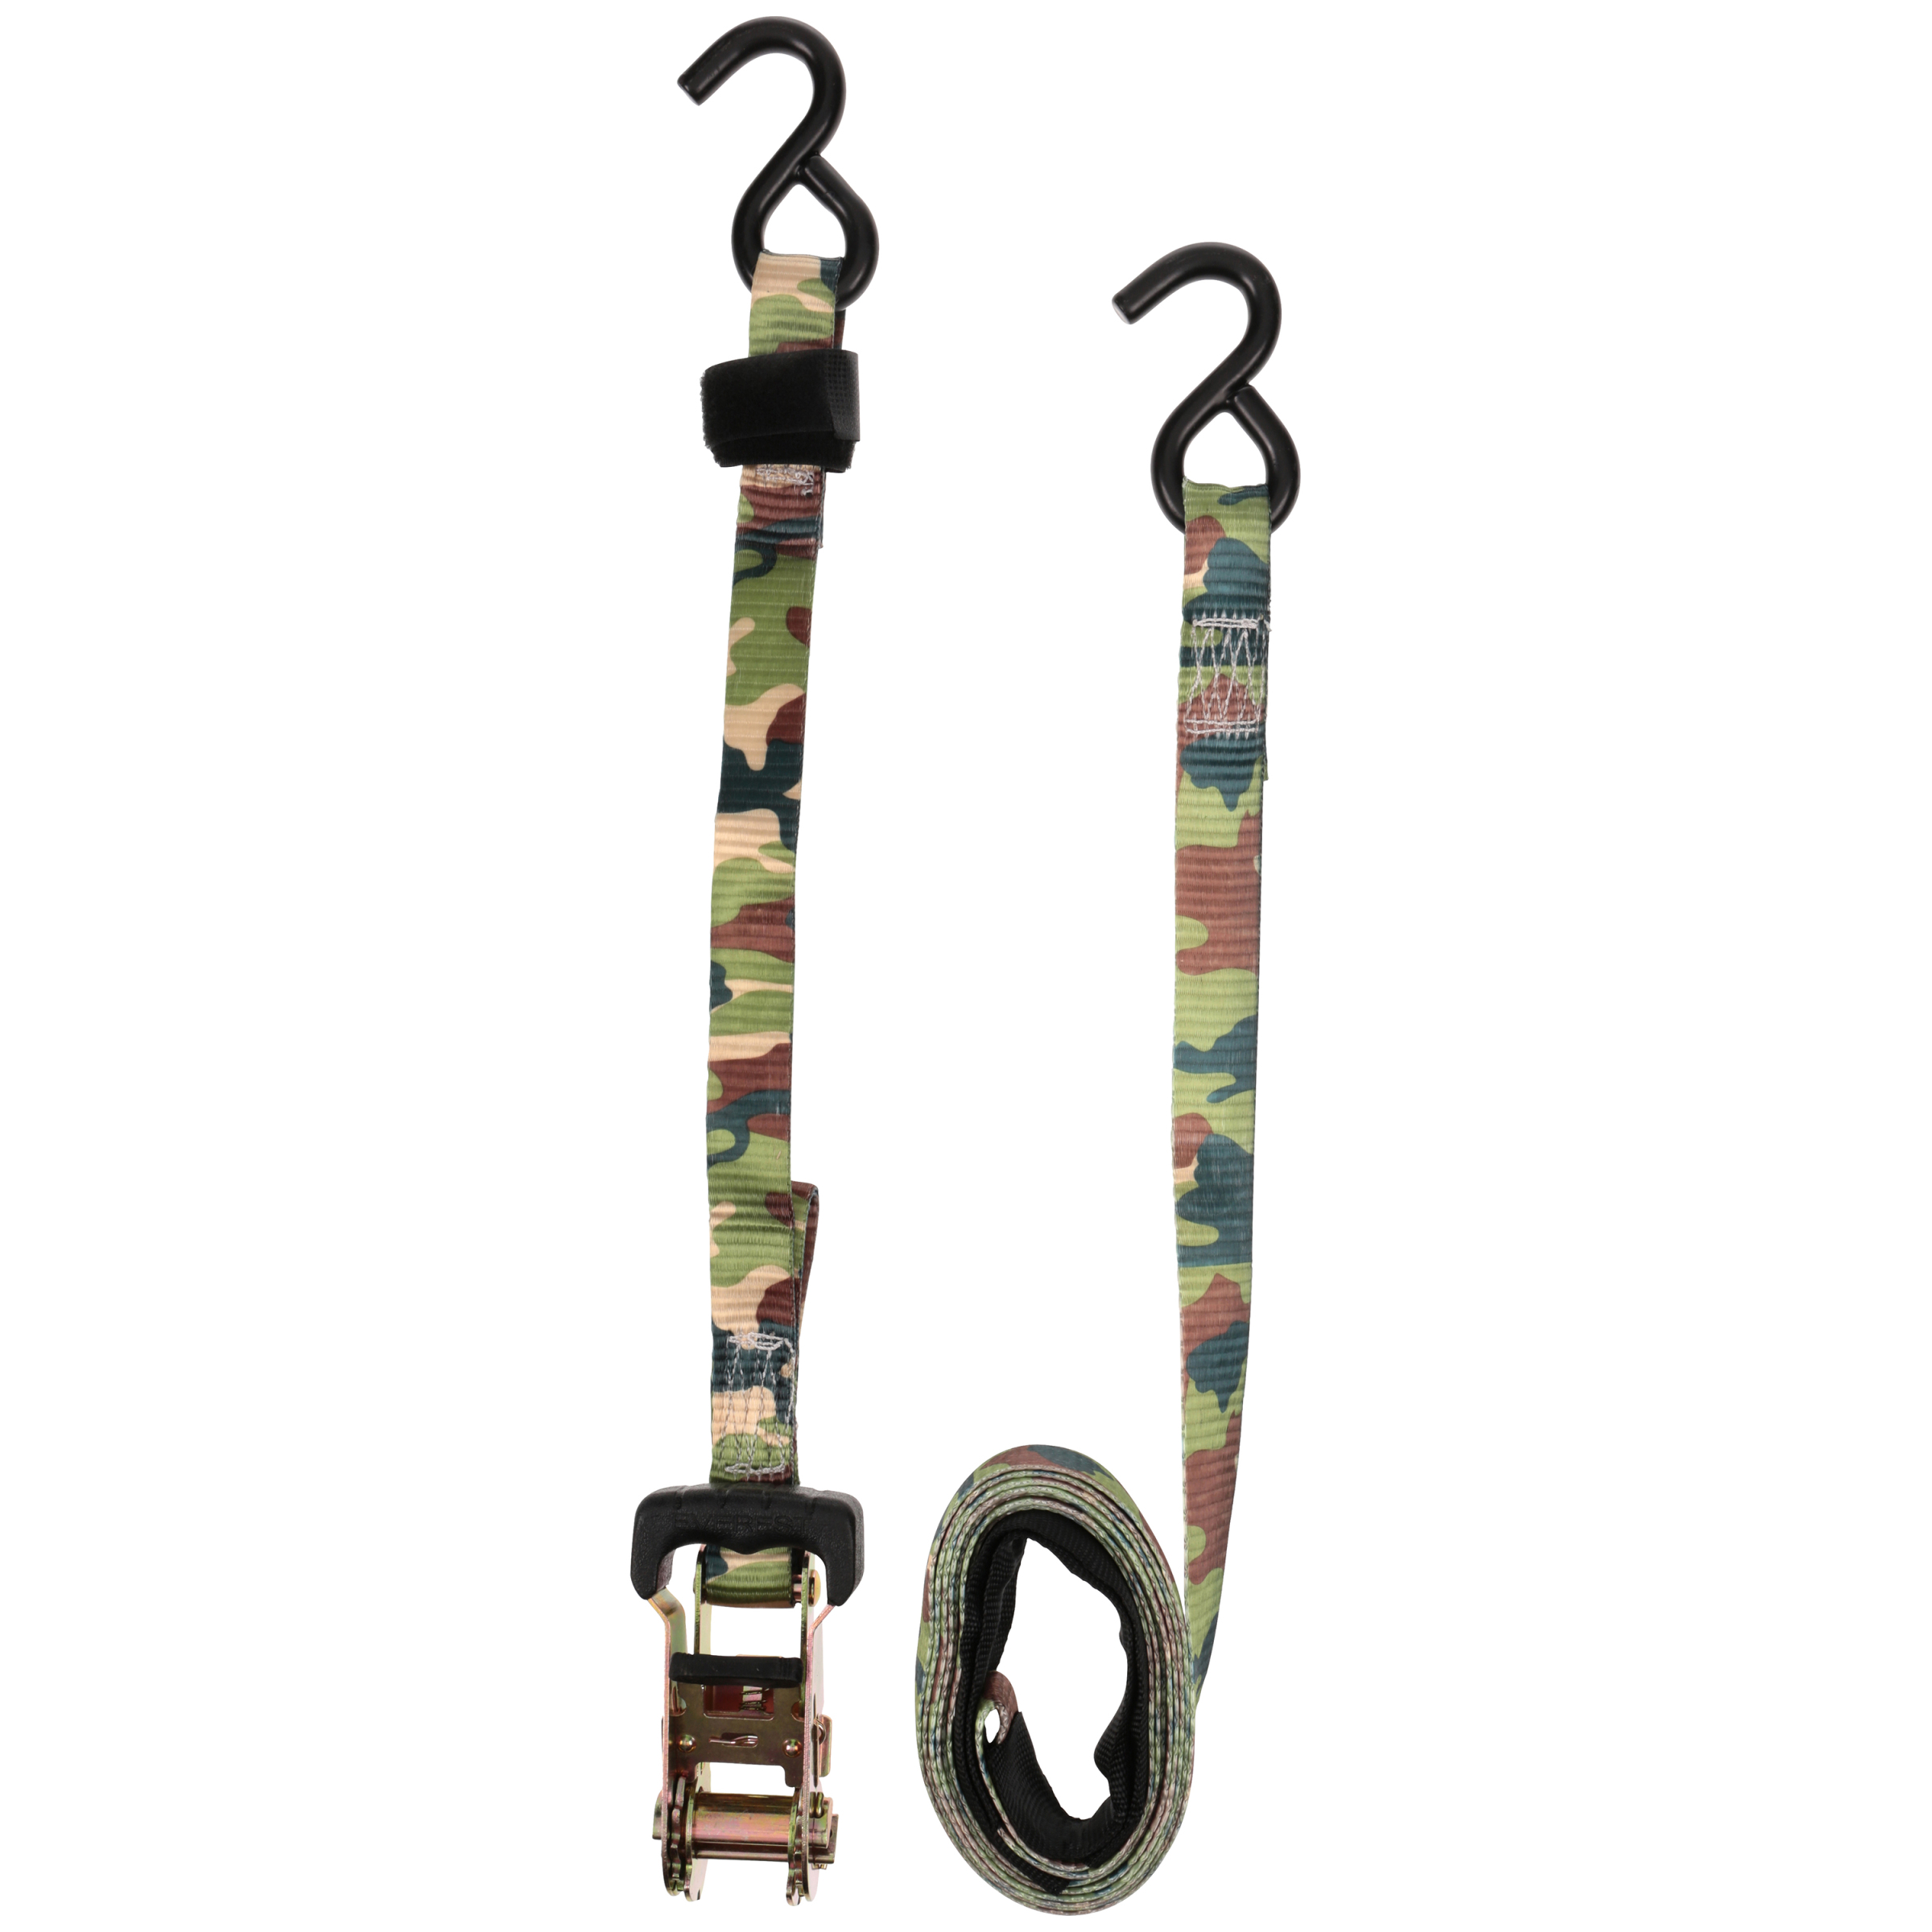 "Everest Camo 1"" x 12' Ratchet Tie Down, 3,000 lbs, 2-Pack"